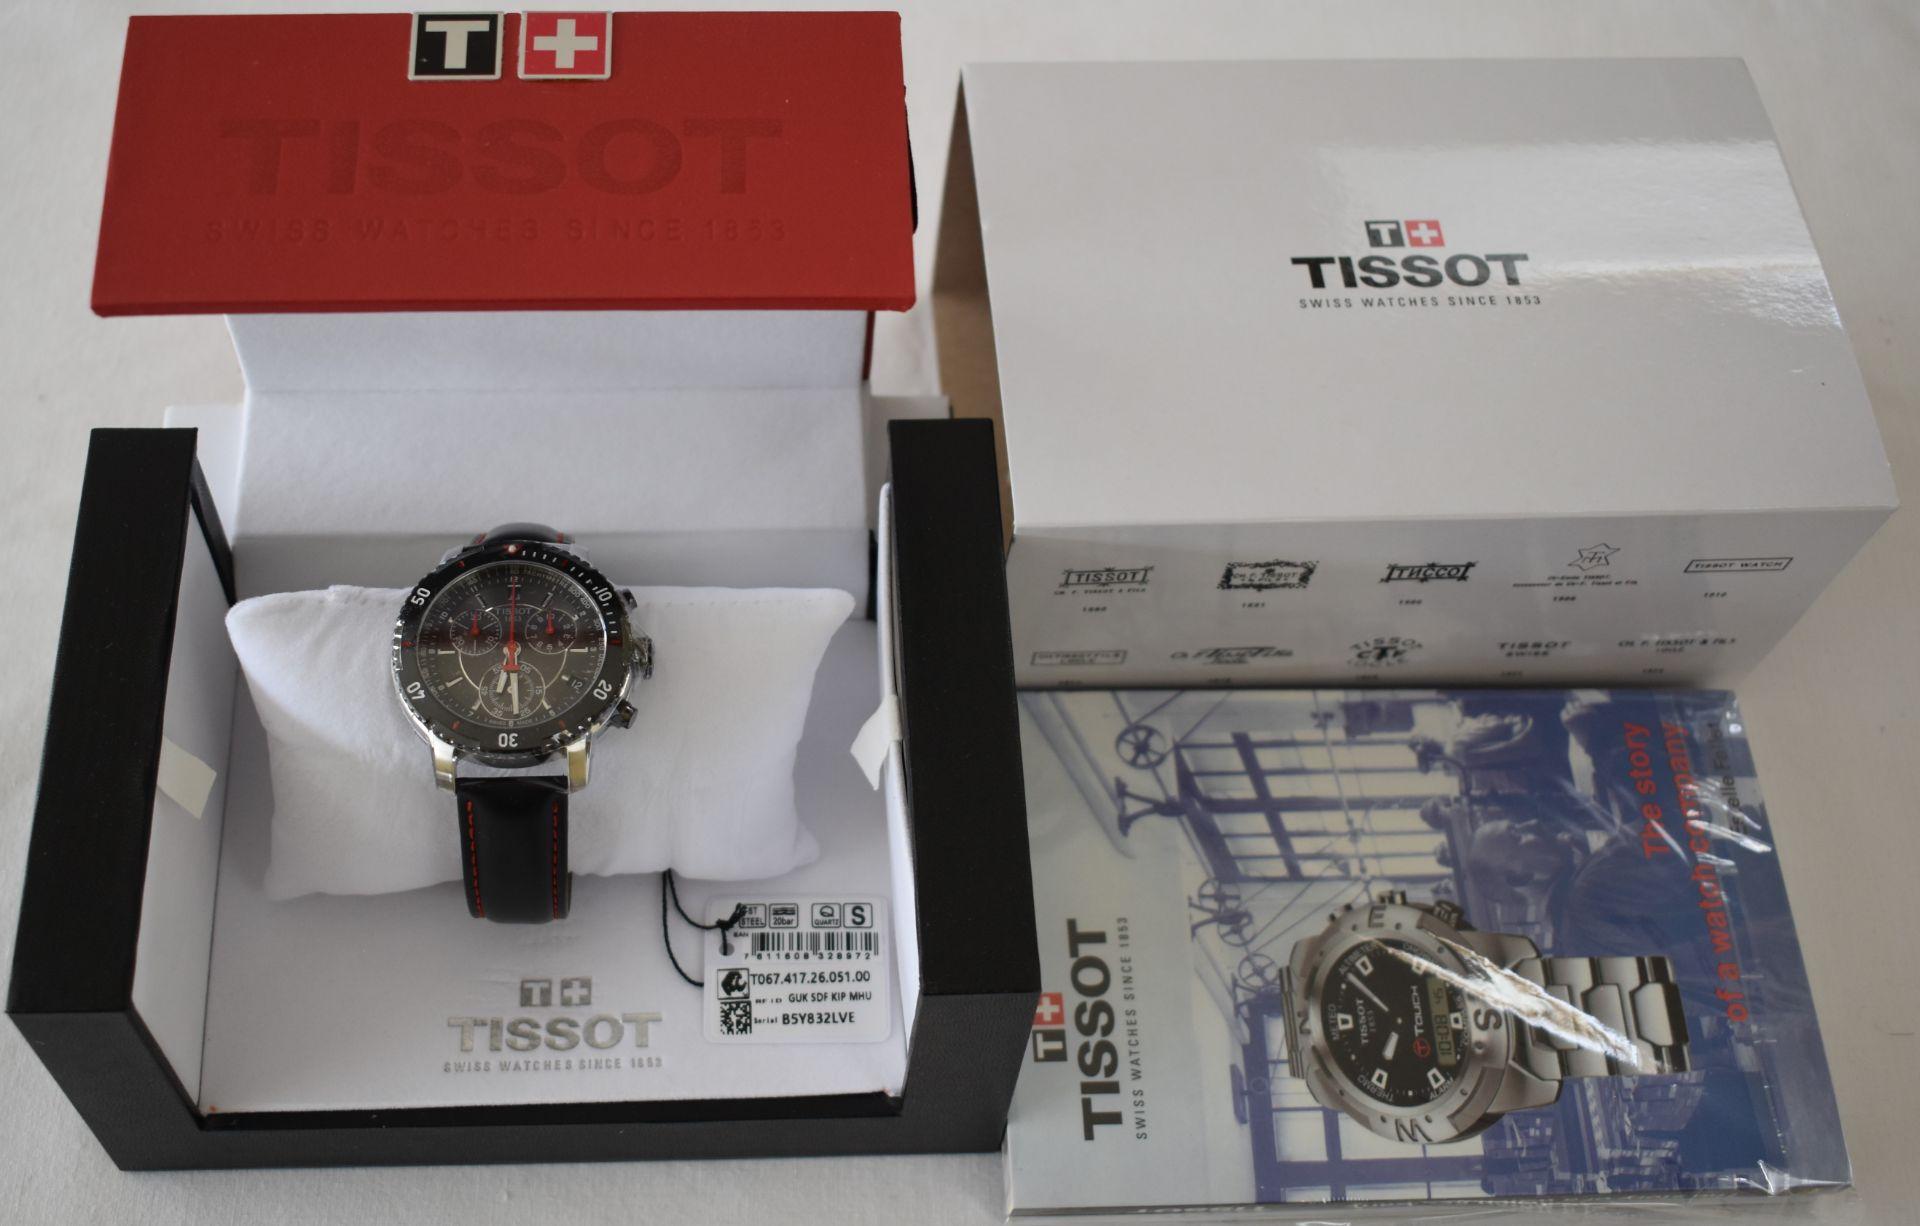 Tissot Men's watch TO67.417.26.051.00 - Image 3 of 3